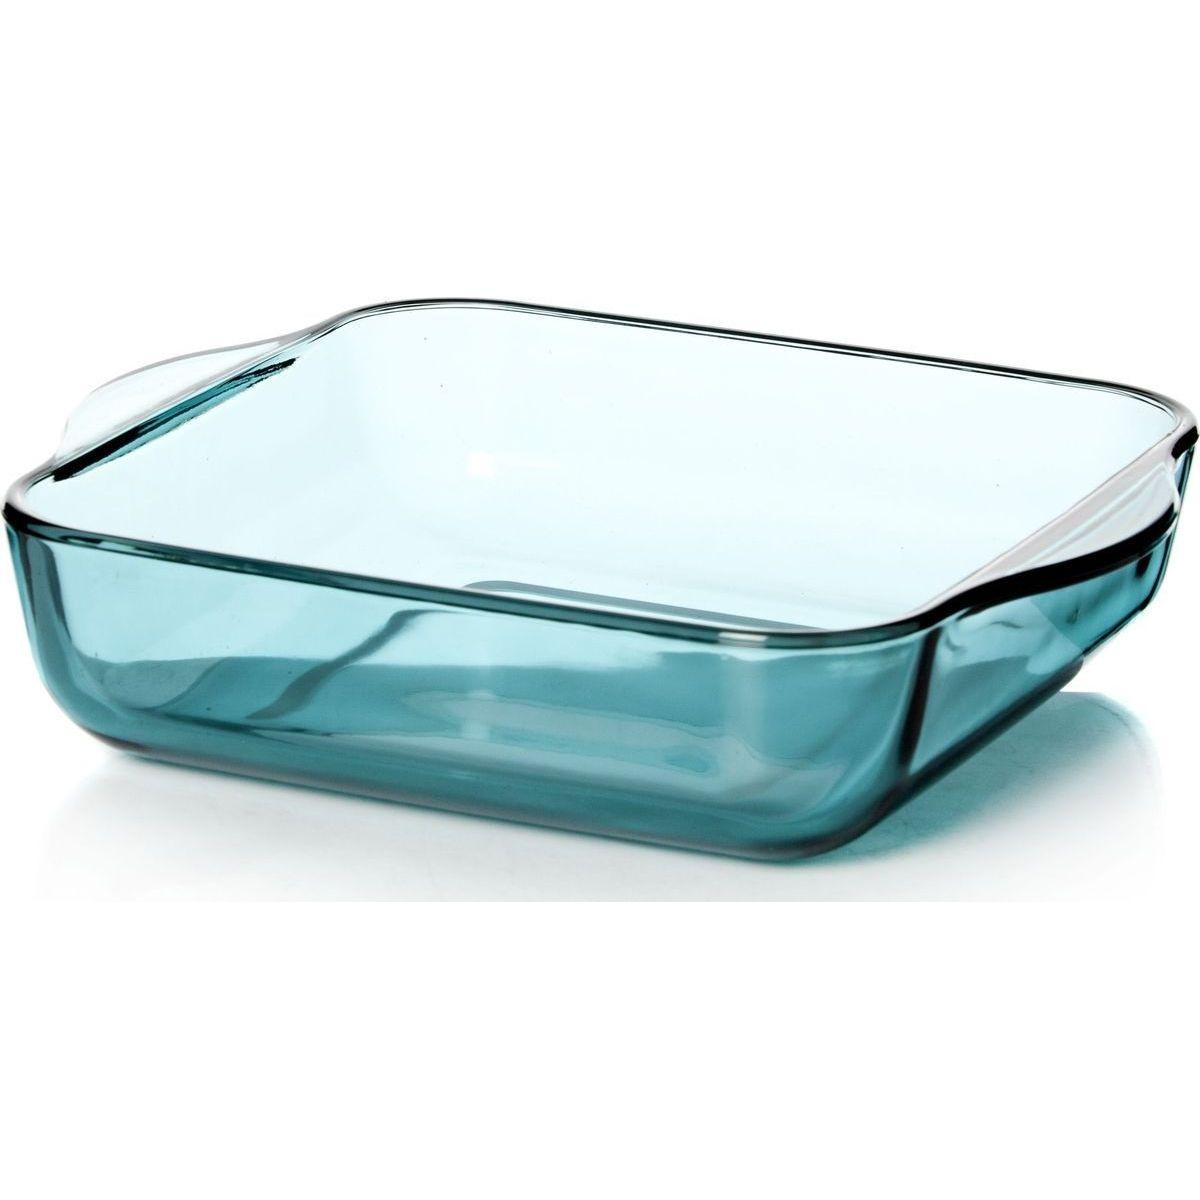 Форма д/выпечки 22х22см цв стеклоПосуда для СВЧ лоток квадратный б/крышки 220*220 мм 2 л<br>